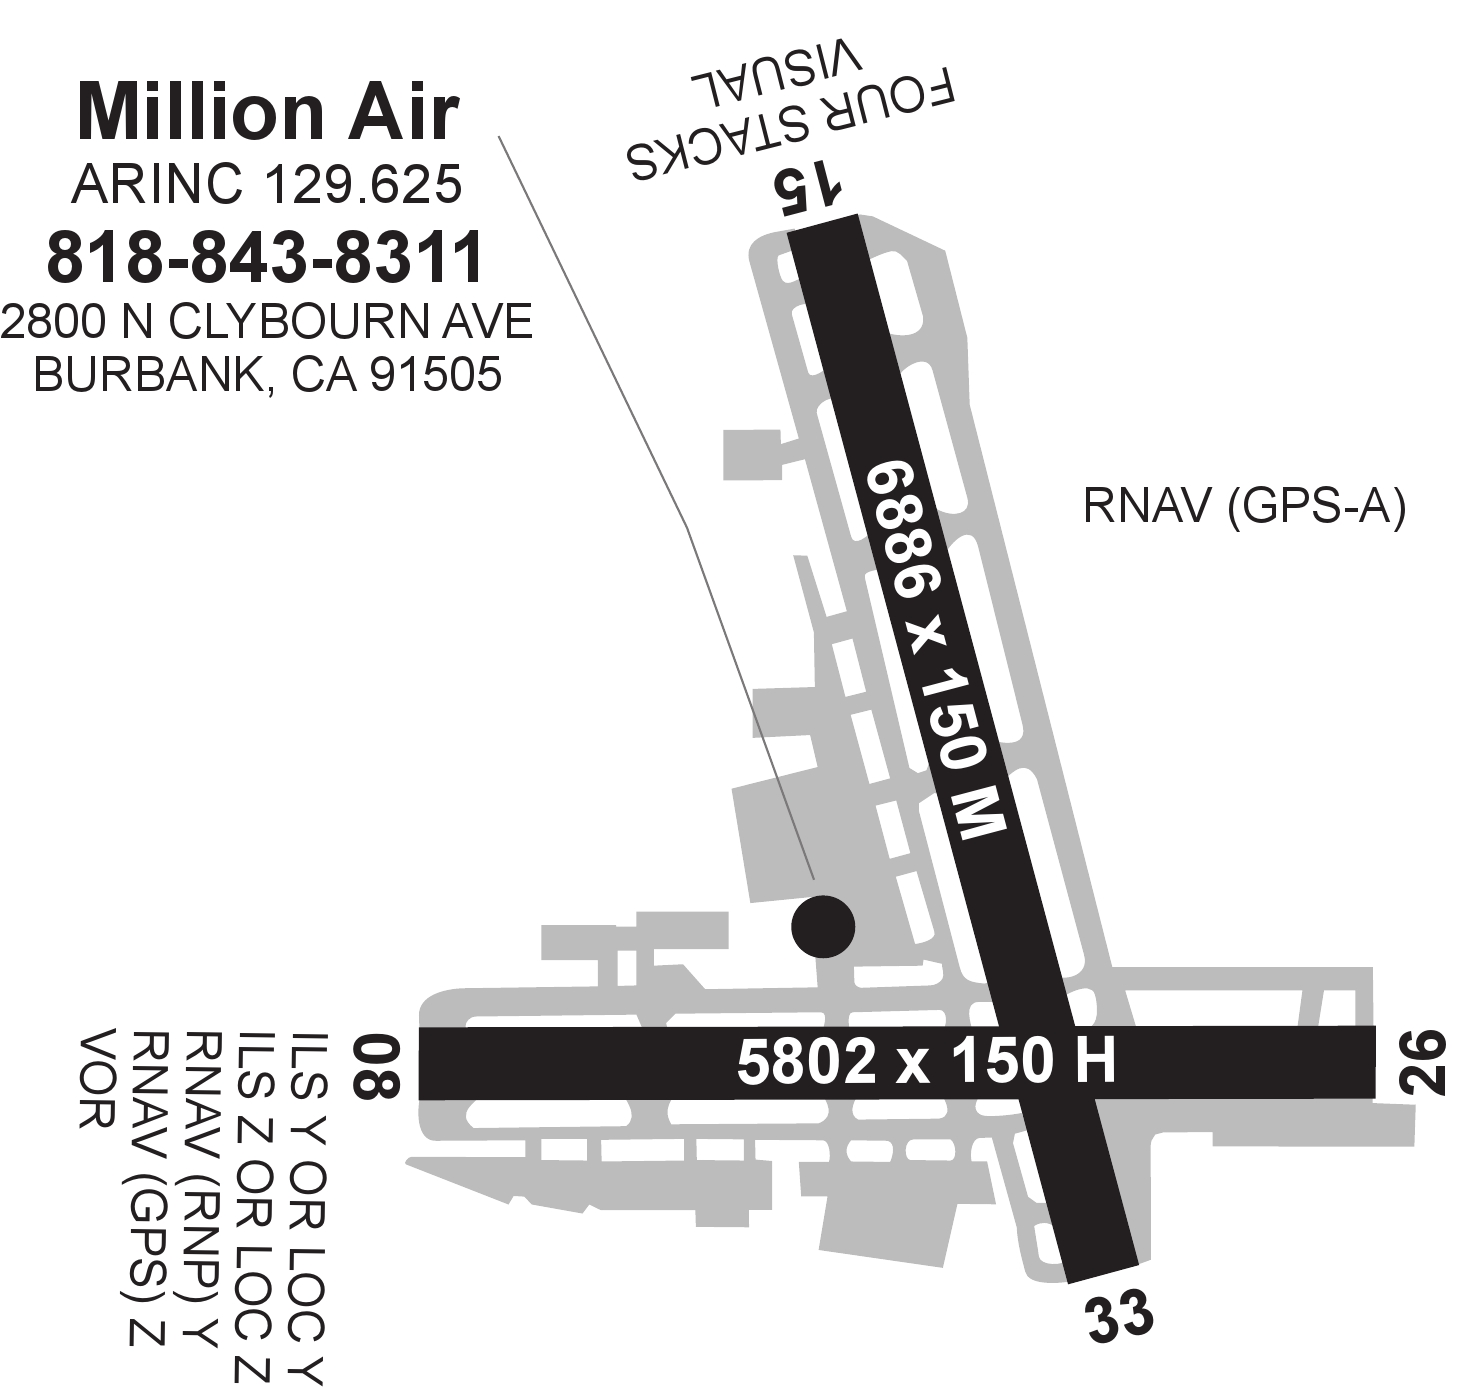 Million Air Burbank